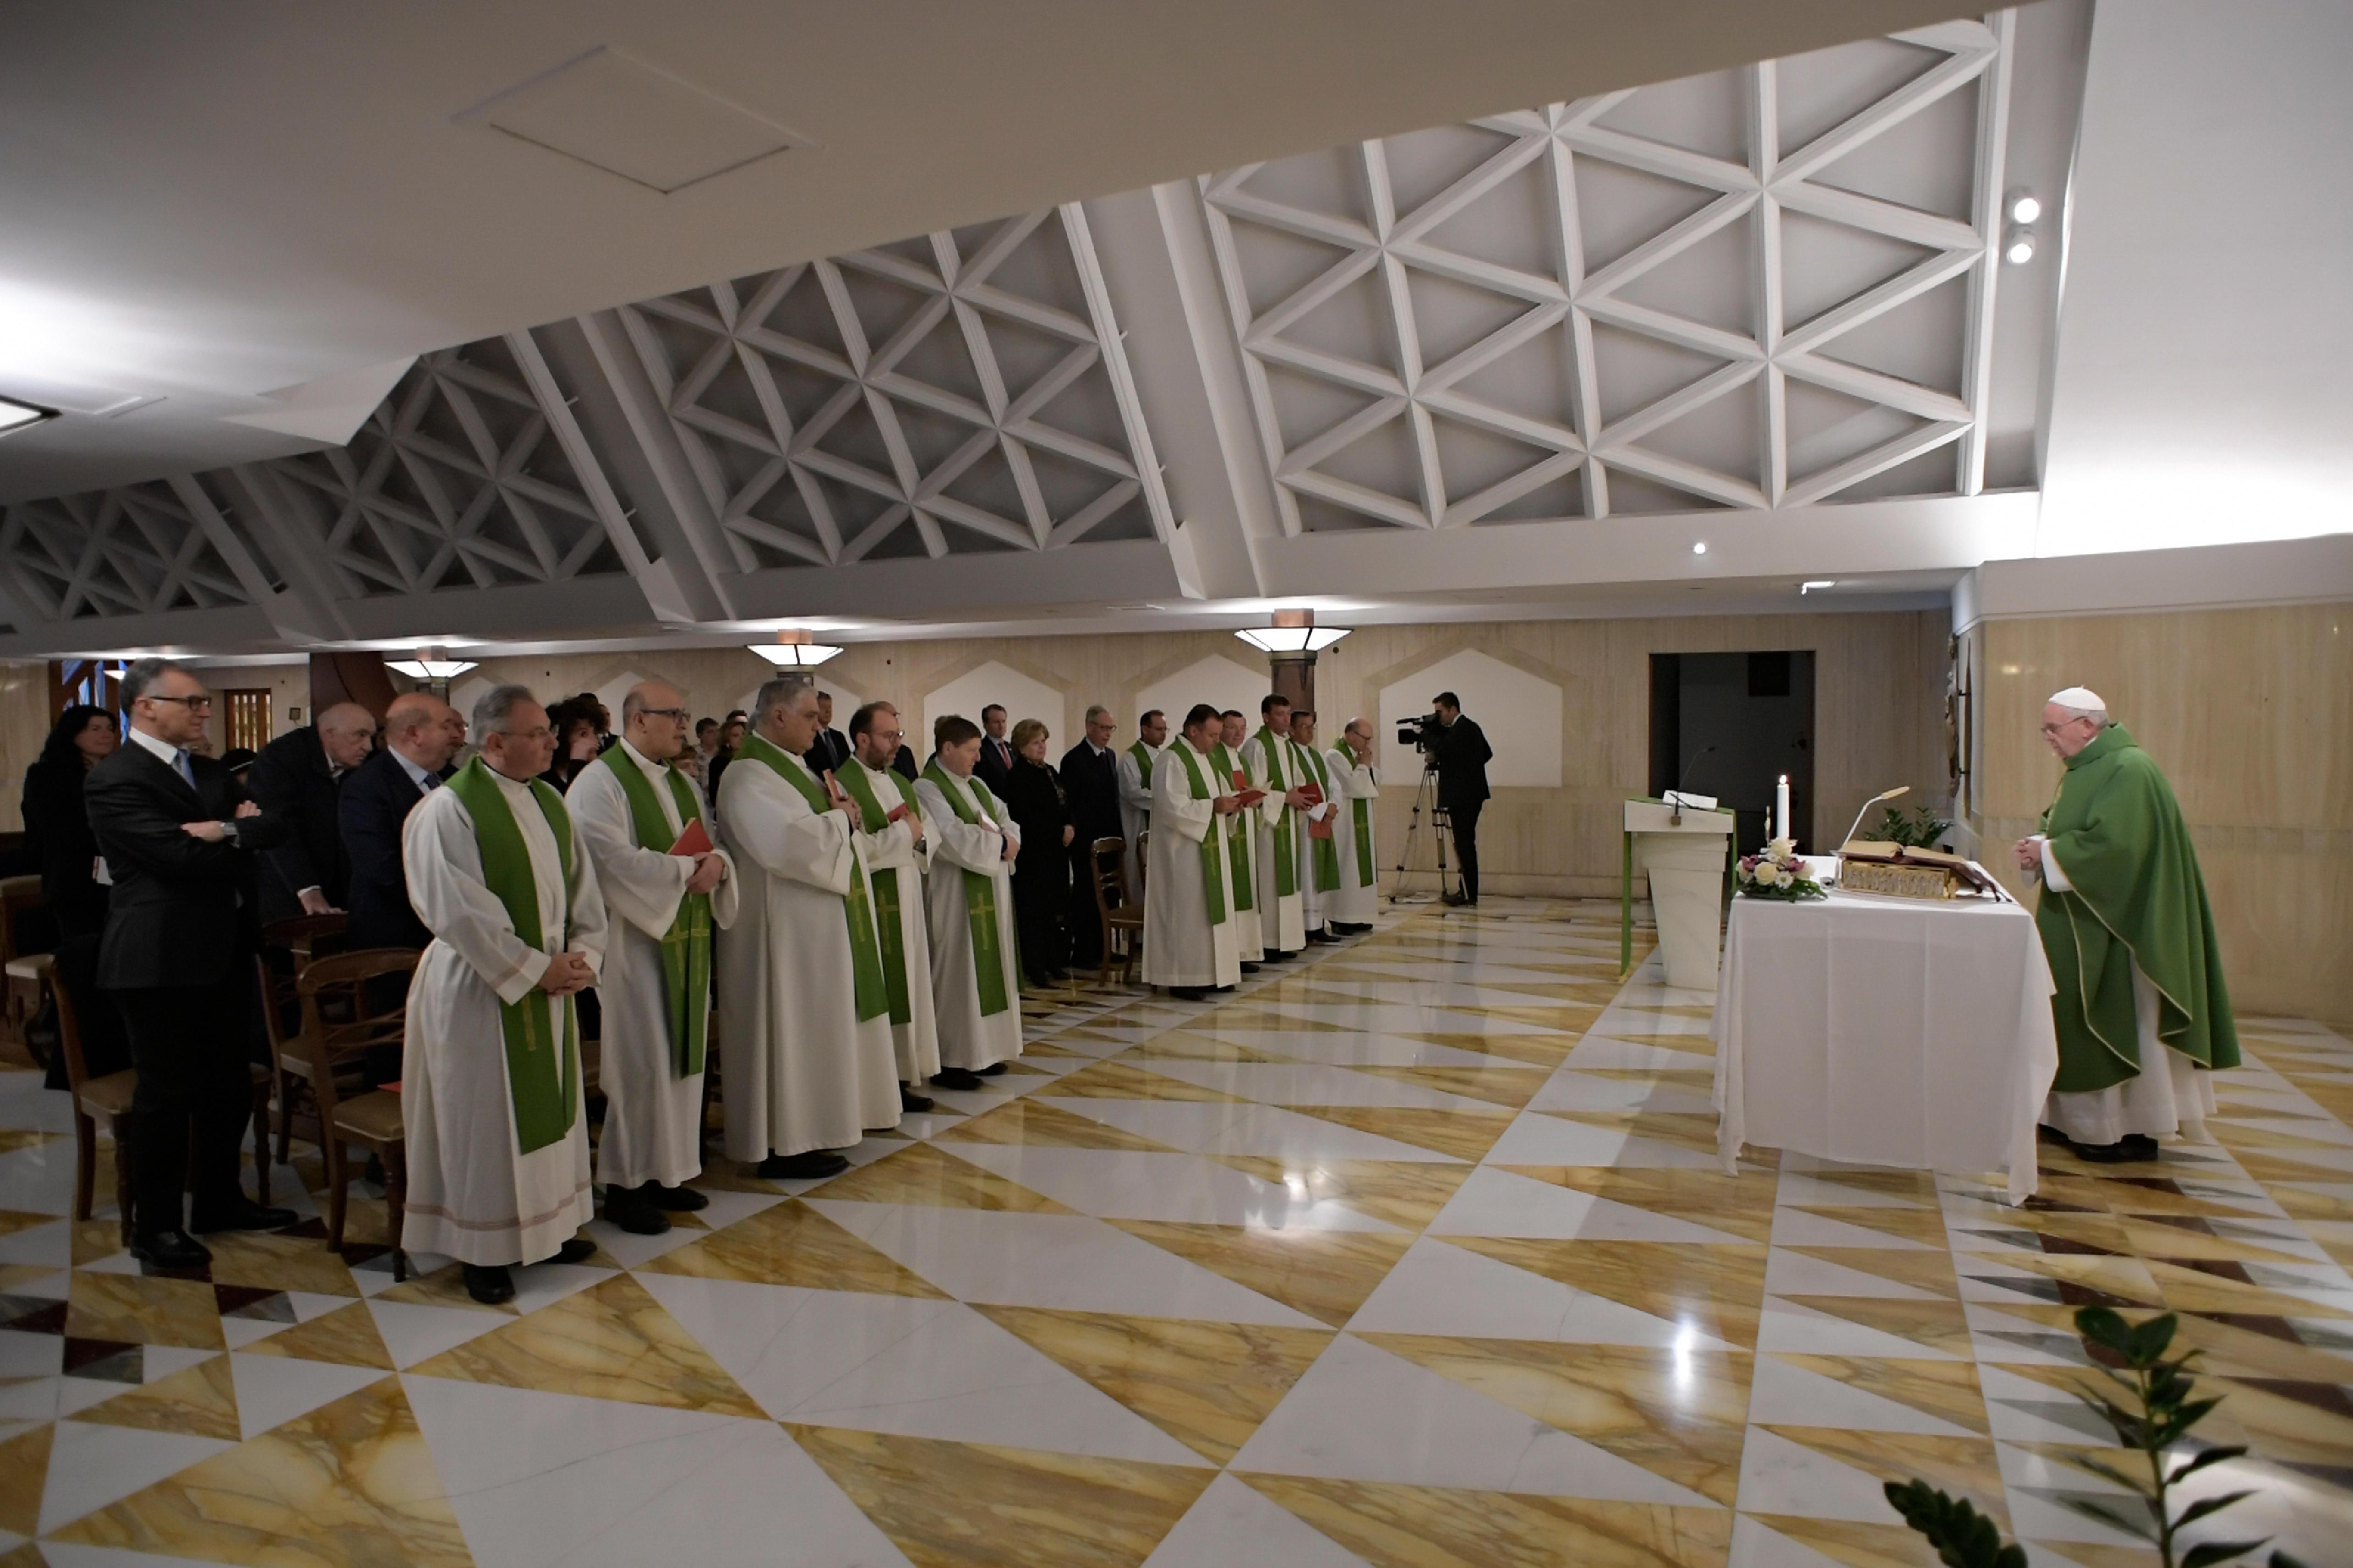 Eucaristía en Santa Marta, 28 febrero 2019 © Vatican Media